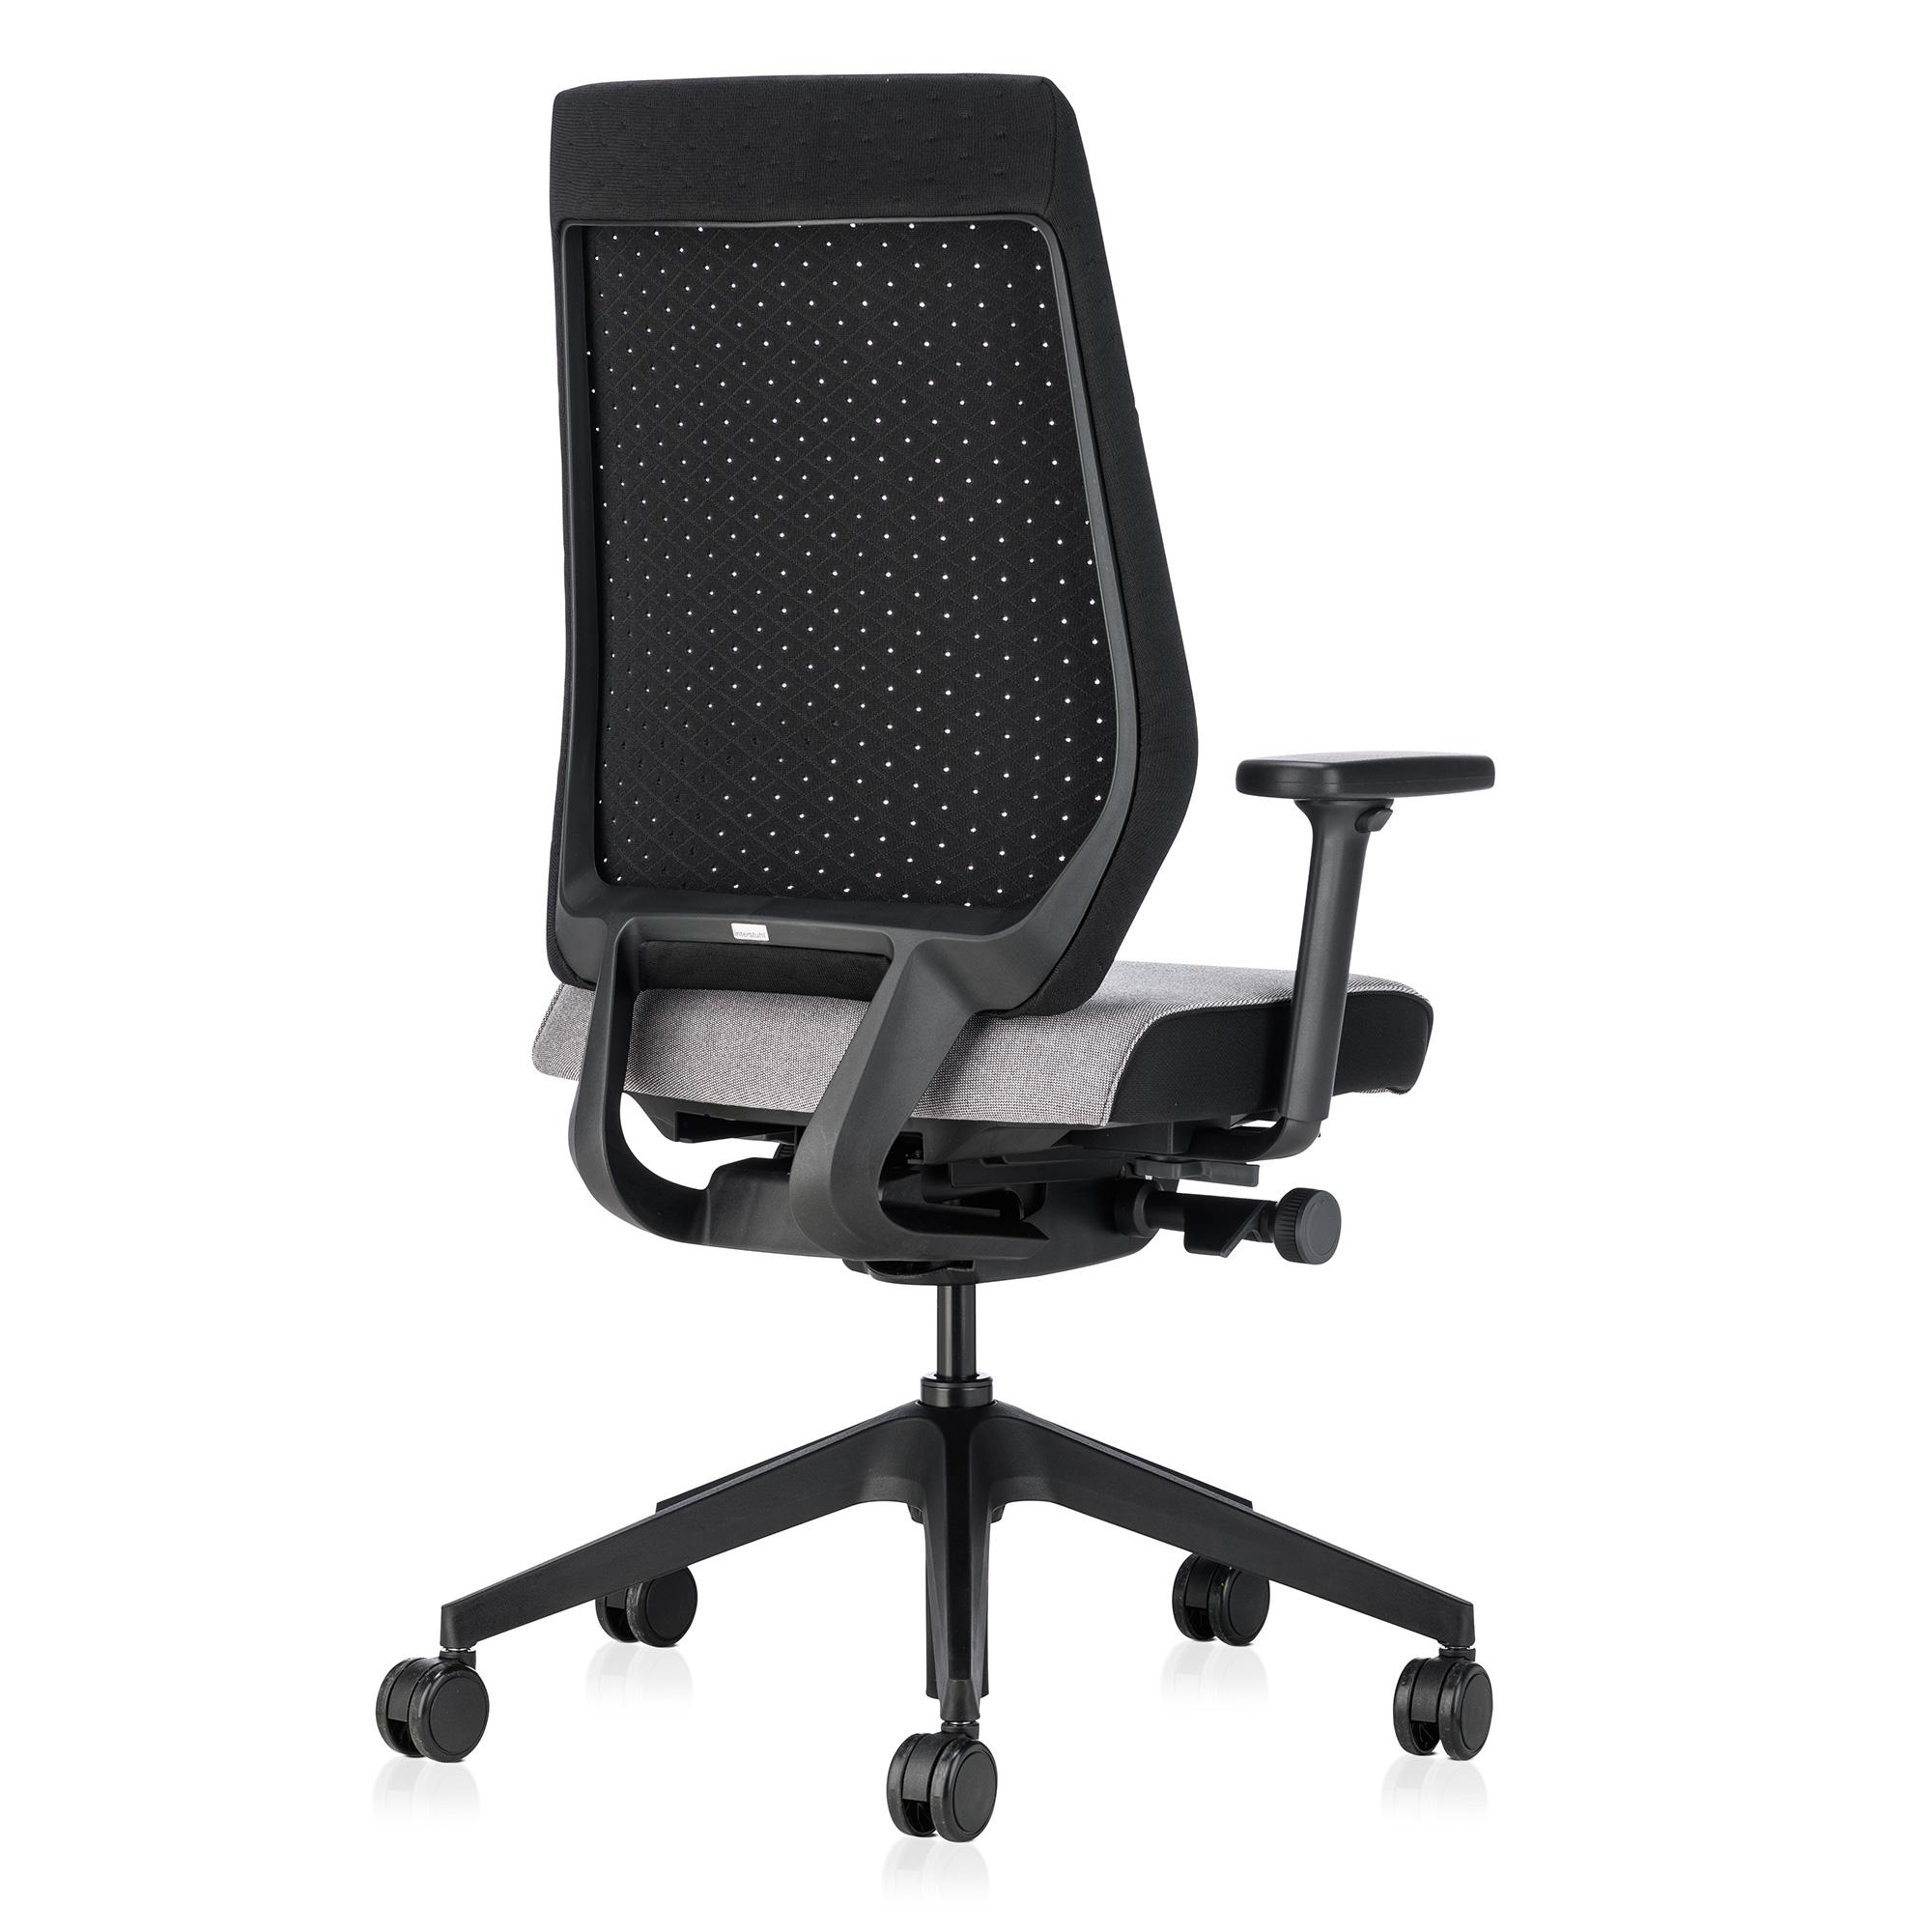 Interstuhl JOYCEis3 JC311 Bürostuhl mit luftiger Softback-Rückenlehne